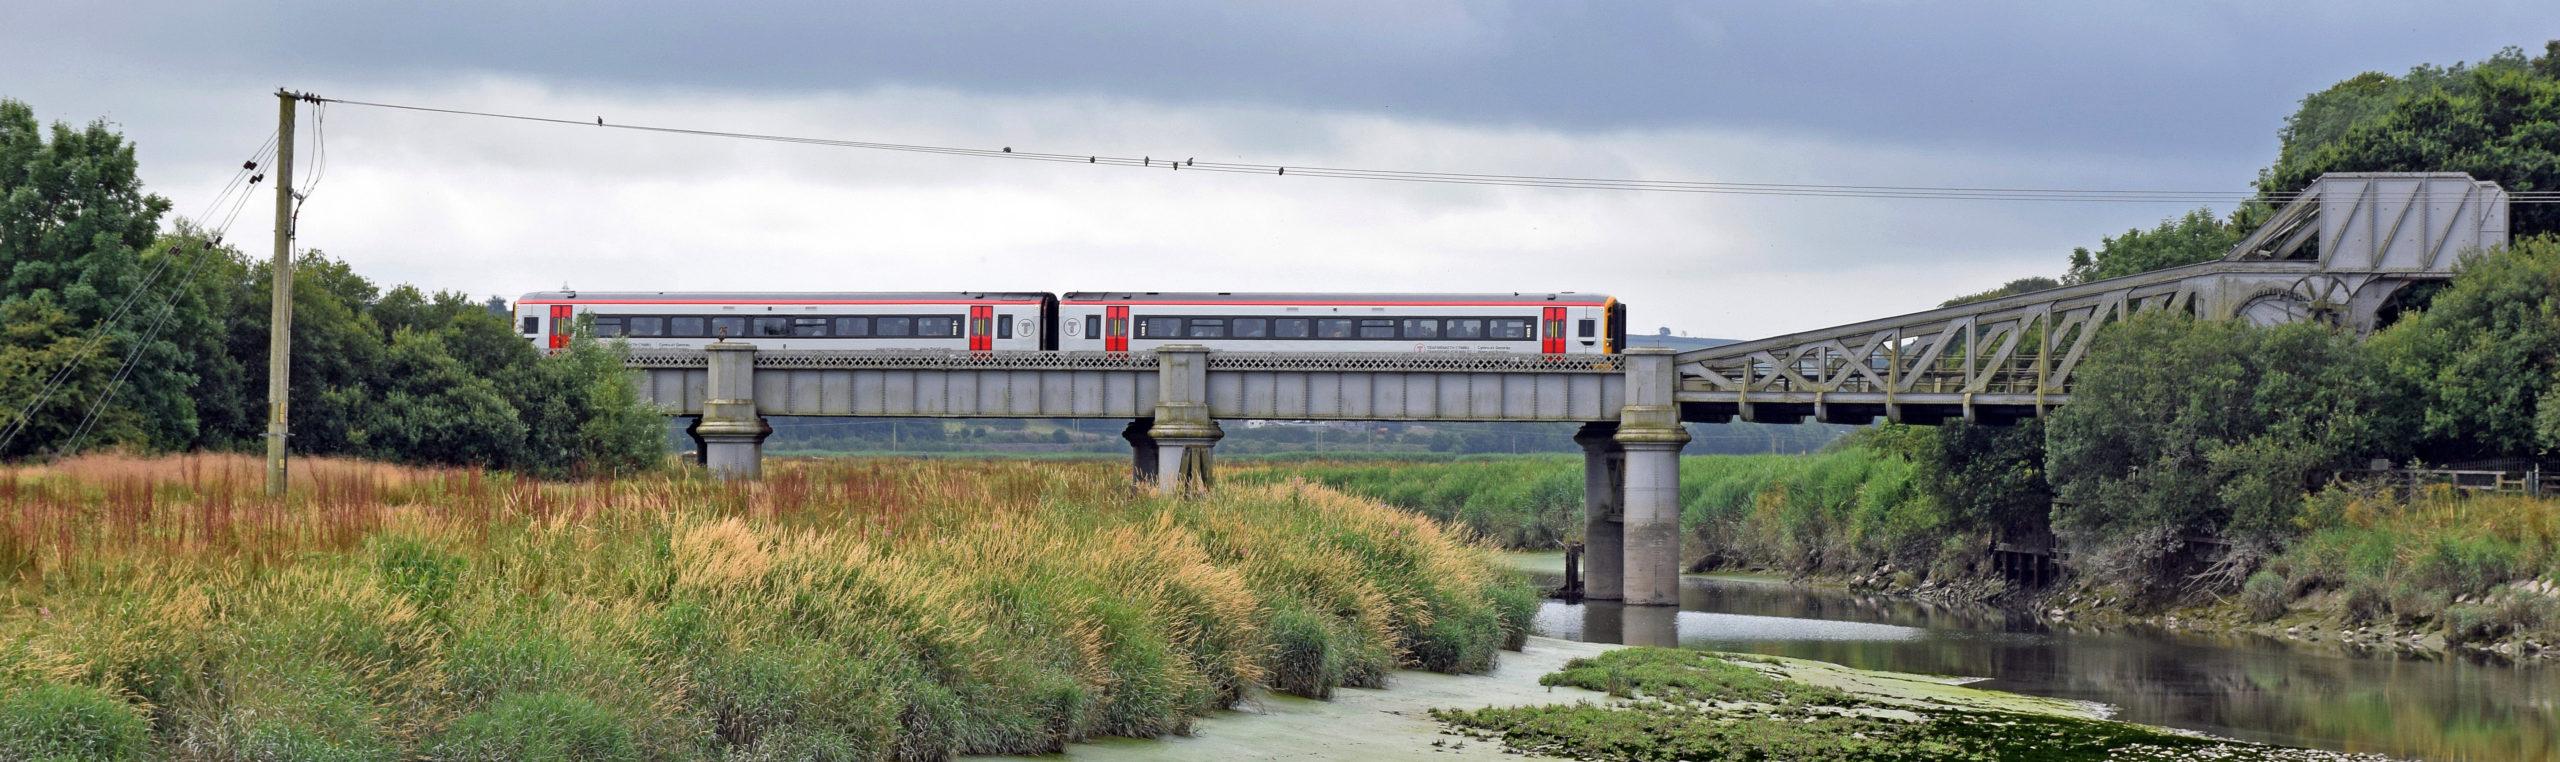 TFW train crossing the river Tywi in Carmarthen